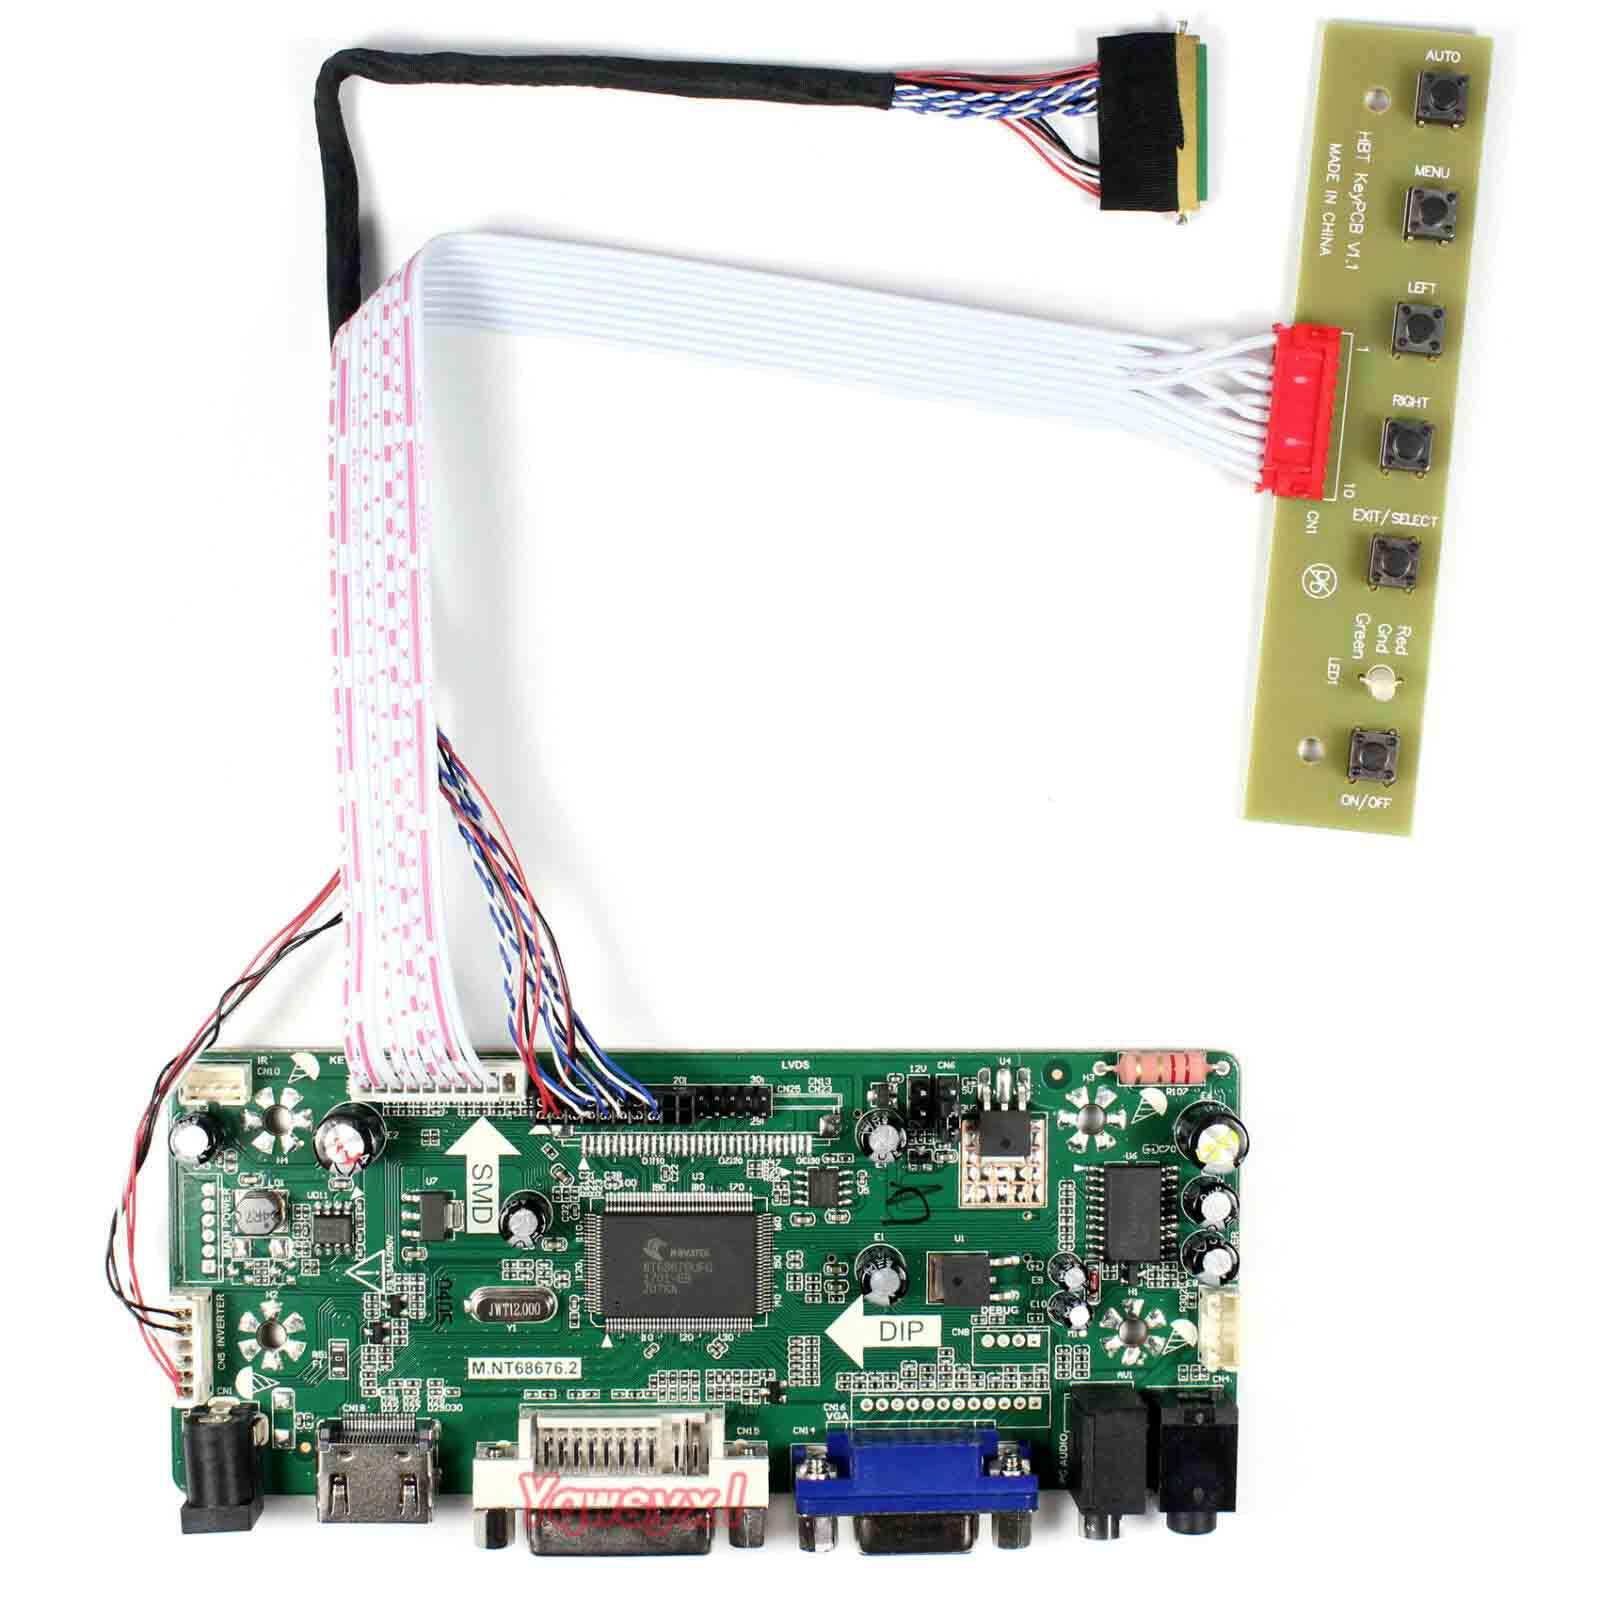 Yqwsyxl Control Board Monitor Kit For LP156WH2-TLA1 LP156WH2(TL)(A1)  HDMI+DVI+VGA LCD LED Screen Controller Board Driver